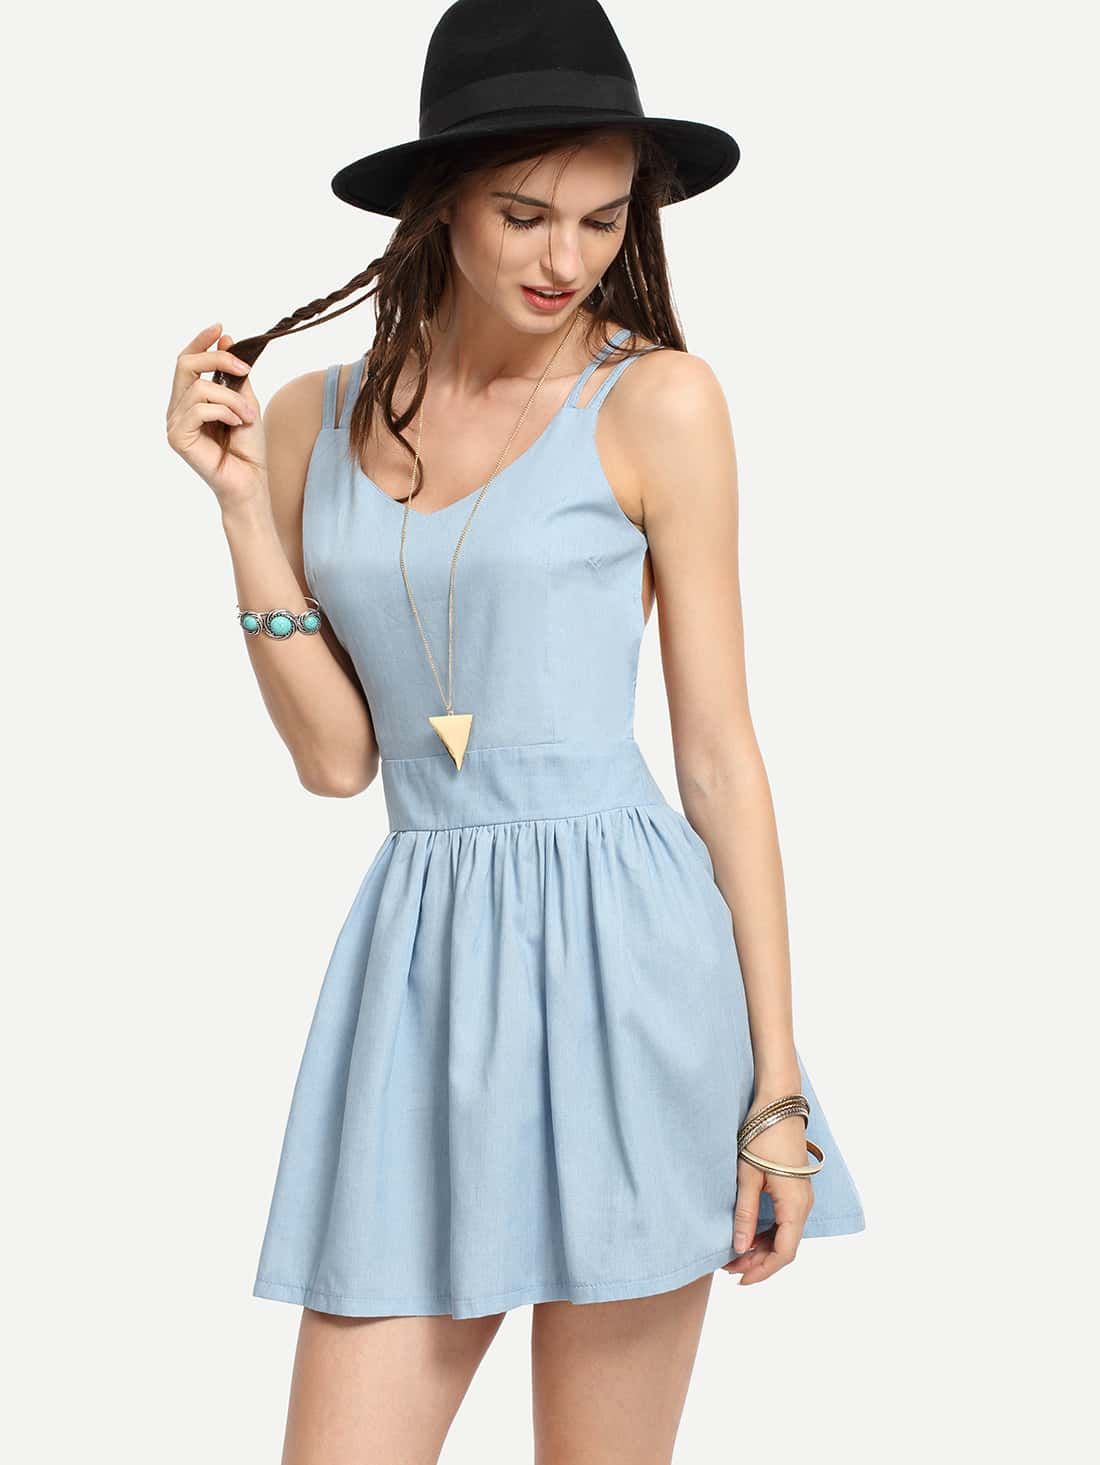 ea84a54306 Crisscross Backless Light Blue Skater Dress